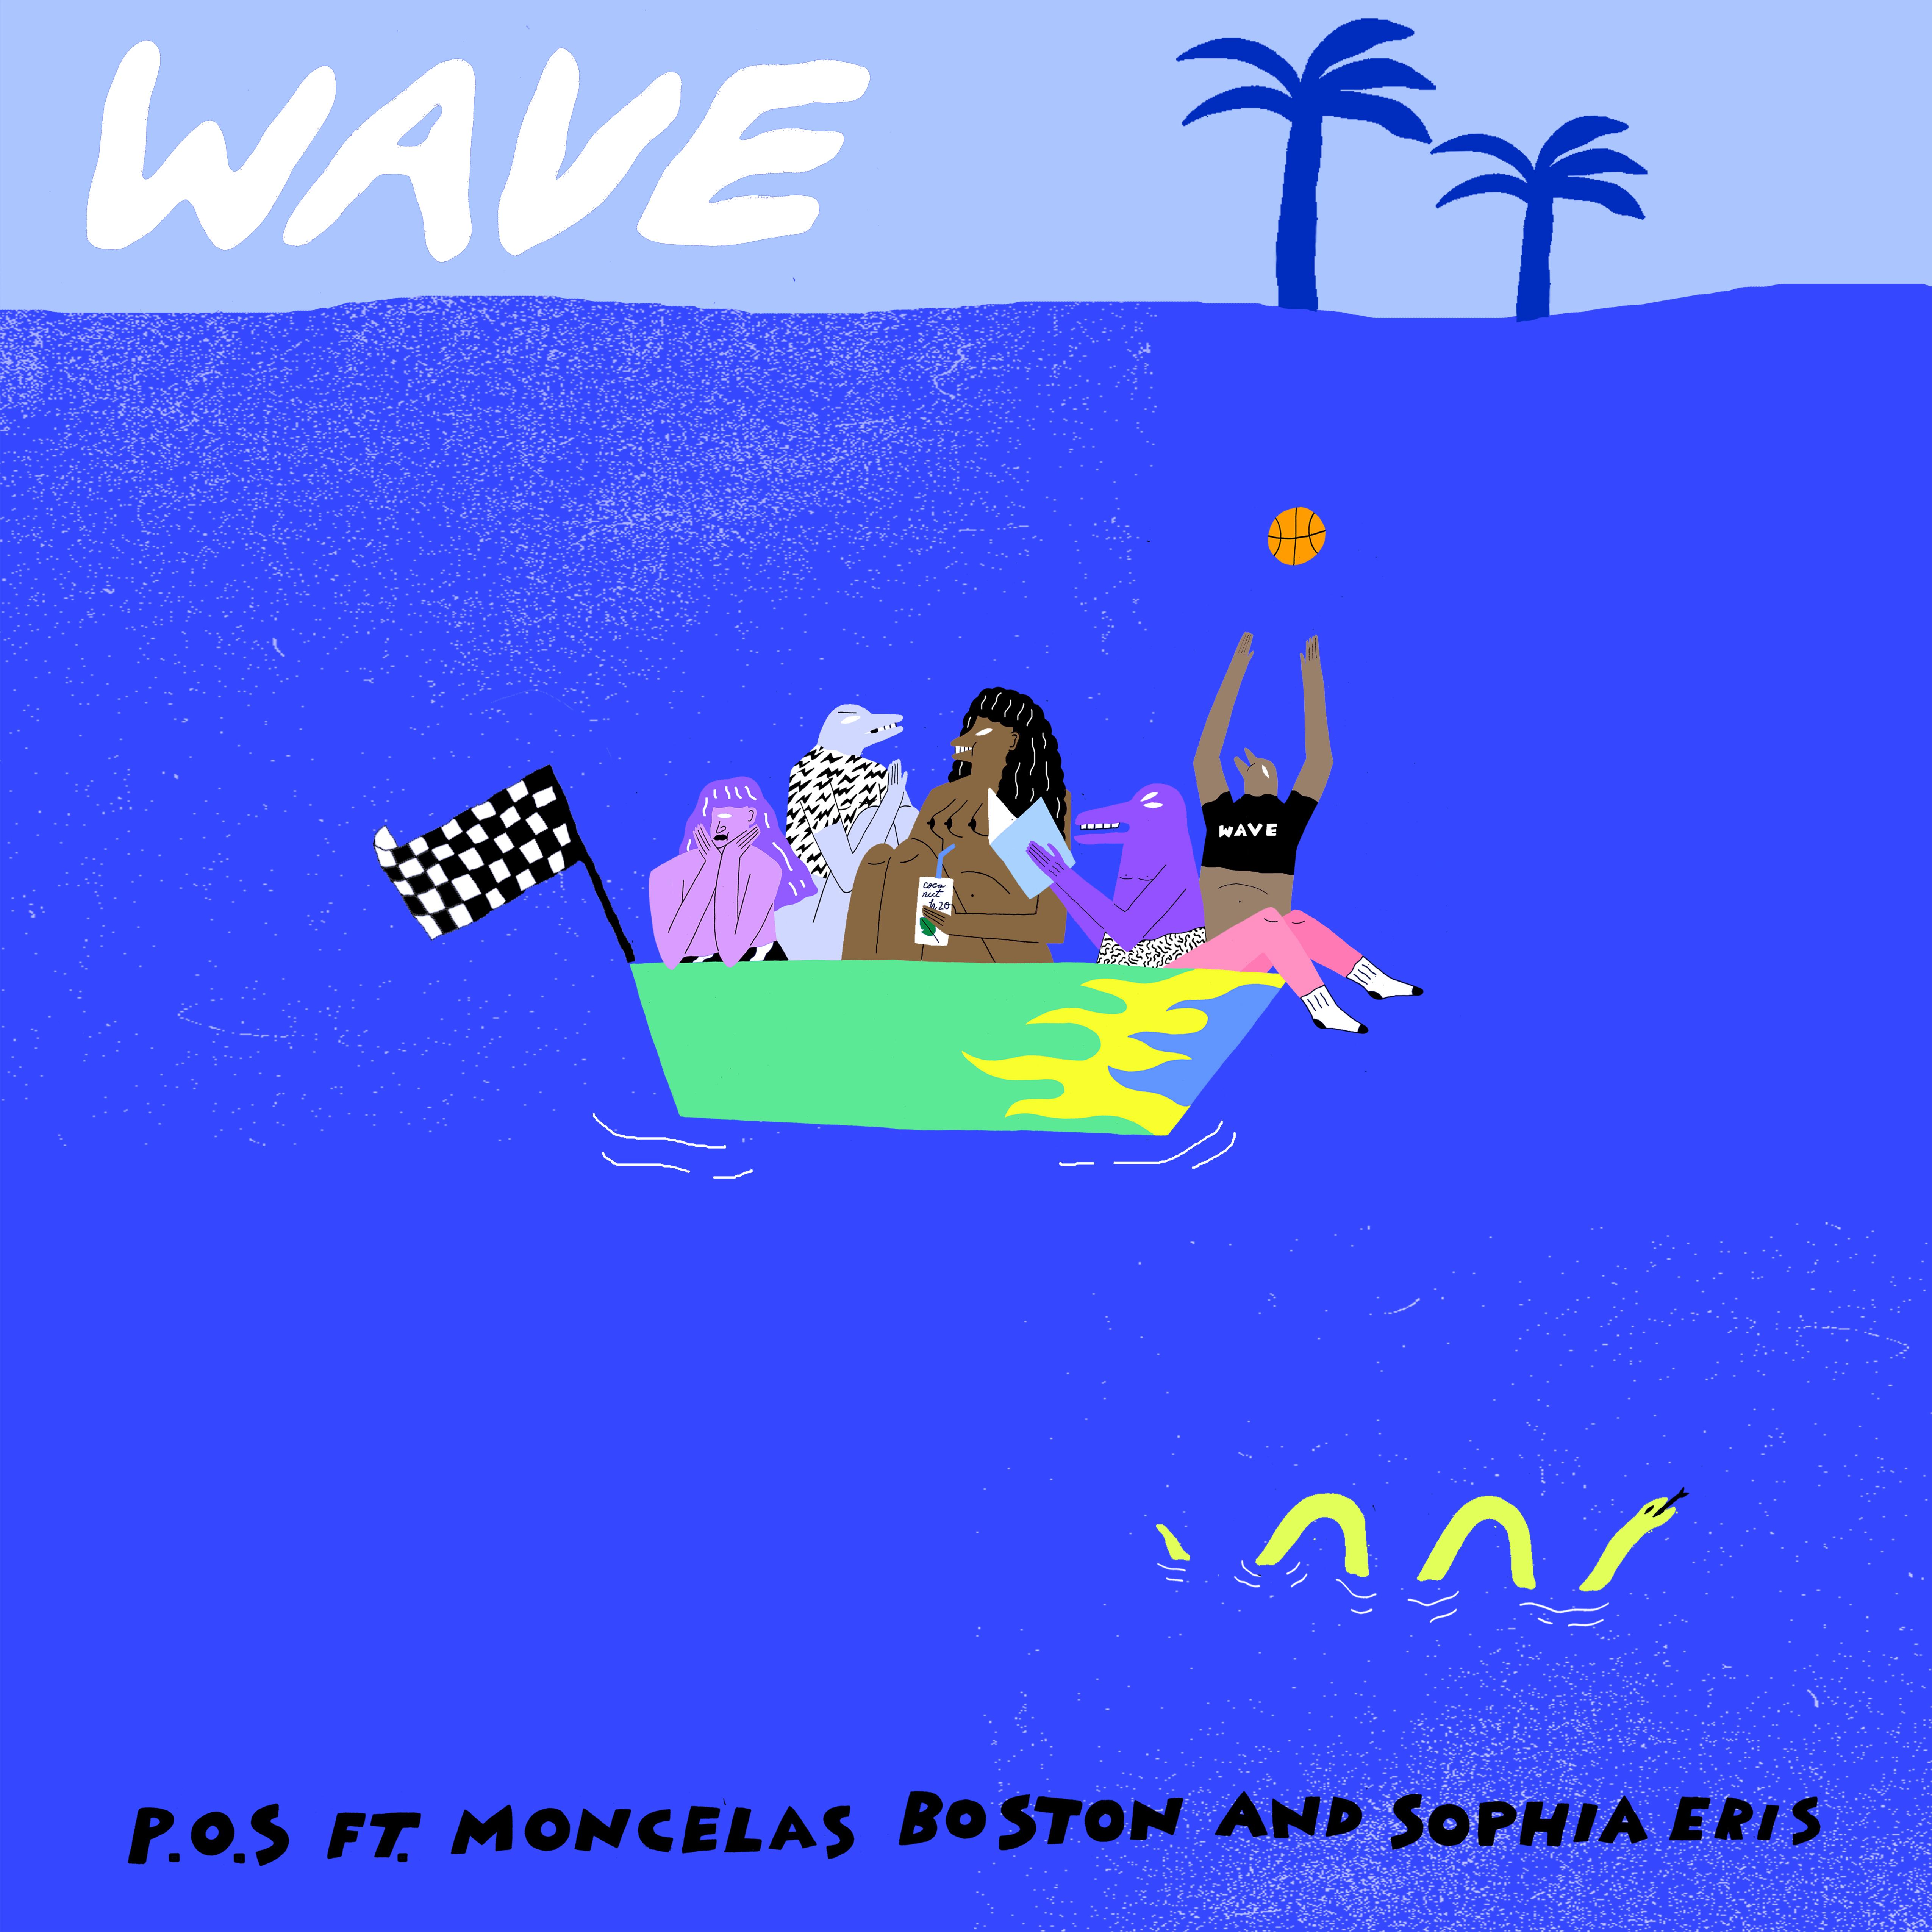 wave single cover3flat P.O.S. flexes his flow on new single Wave featuring Moncelas Boston and Sophia Eris    listen